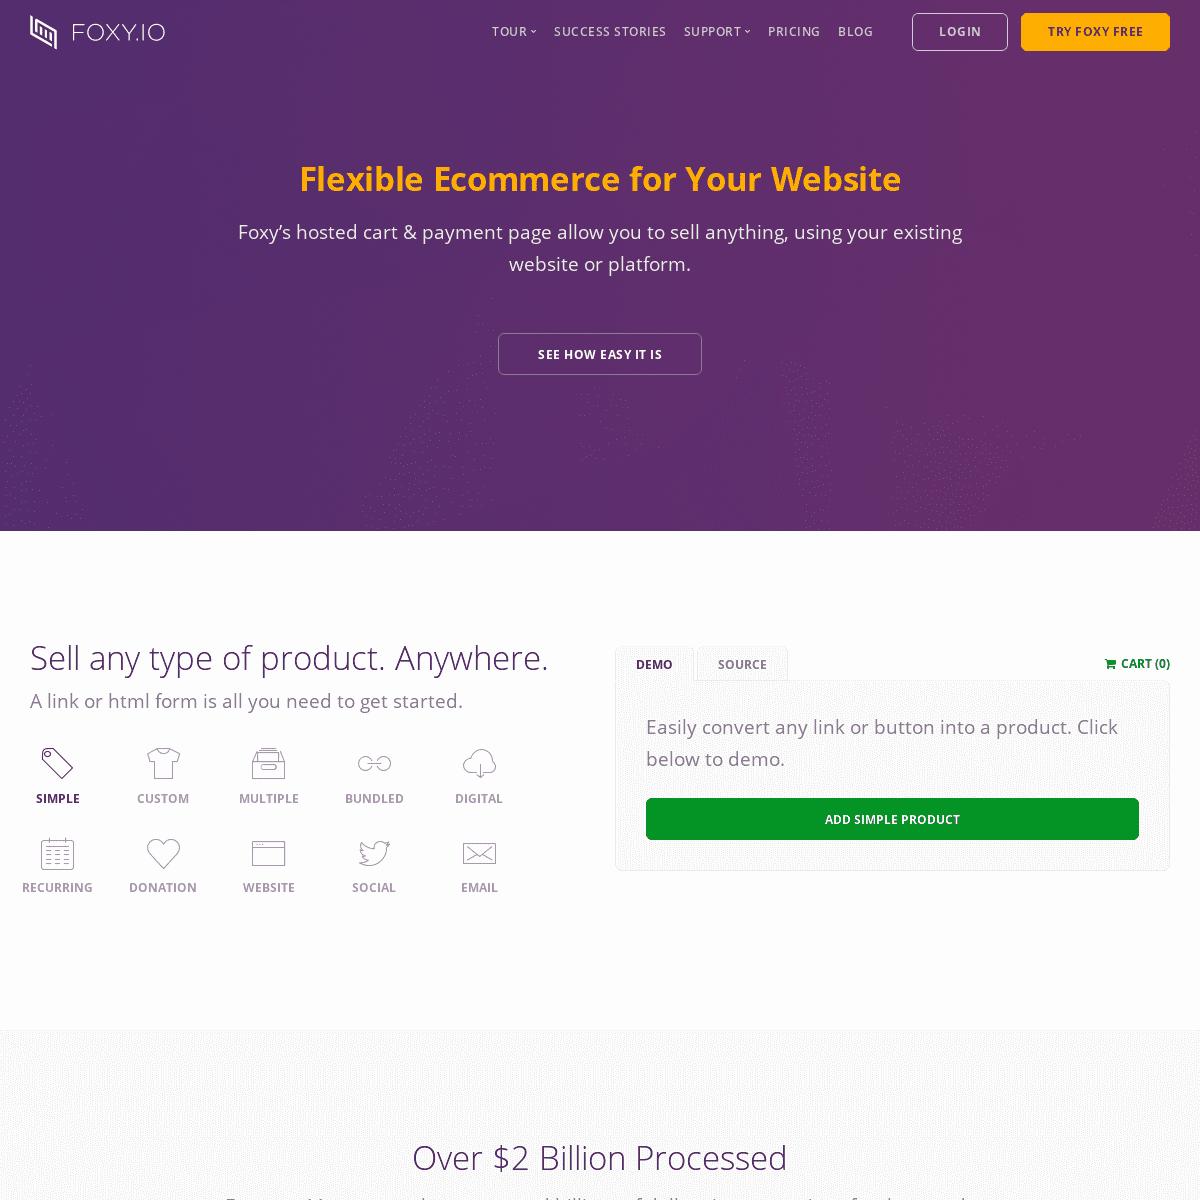 ArchiveBay.com - foxy.io - Foxy.io - Flexible Ecommerce for Your Website